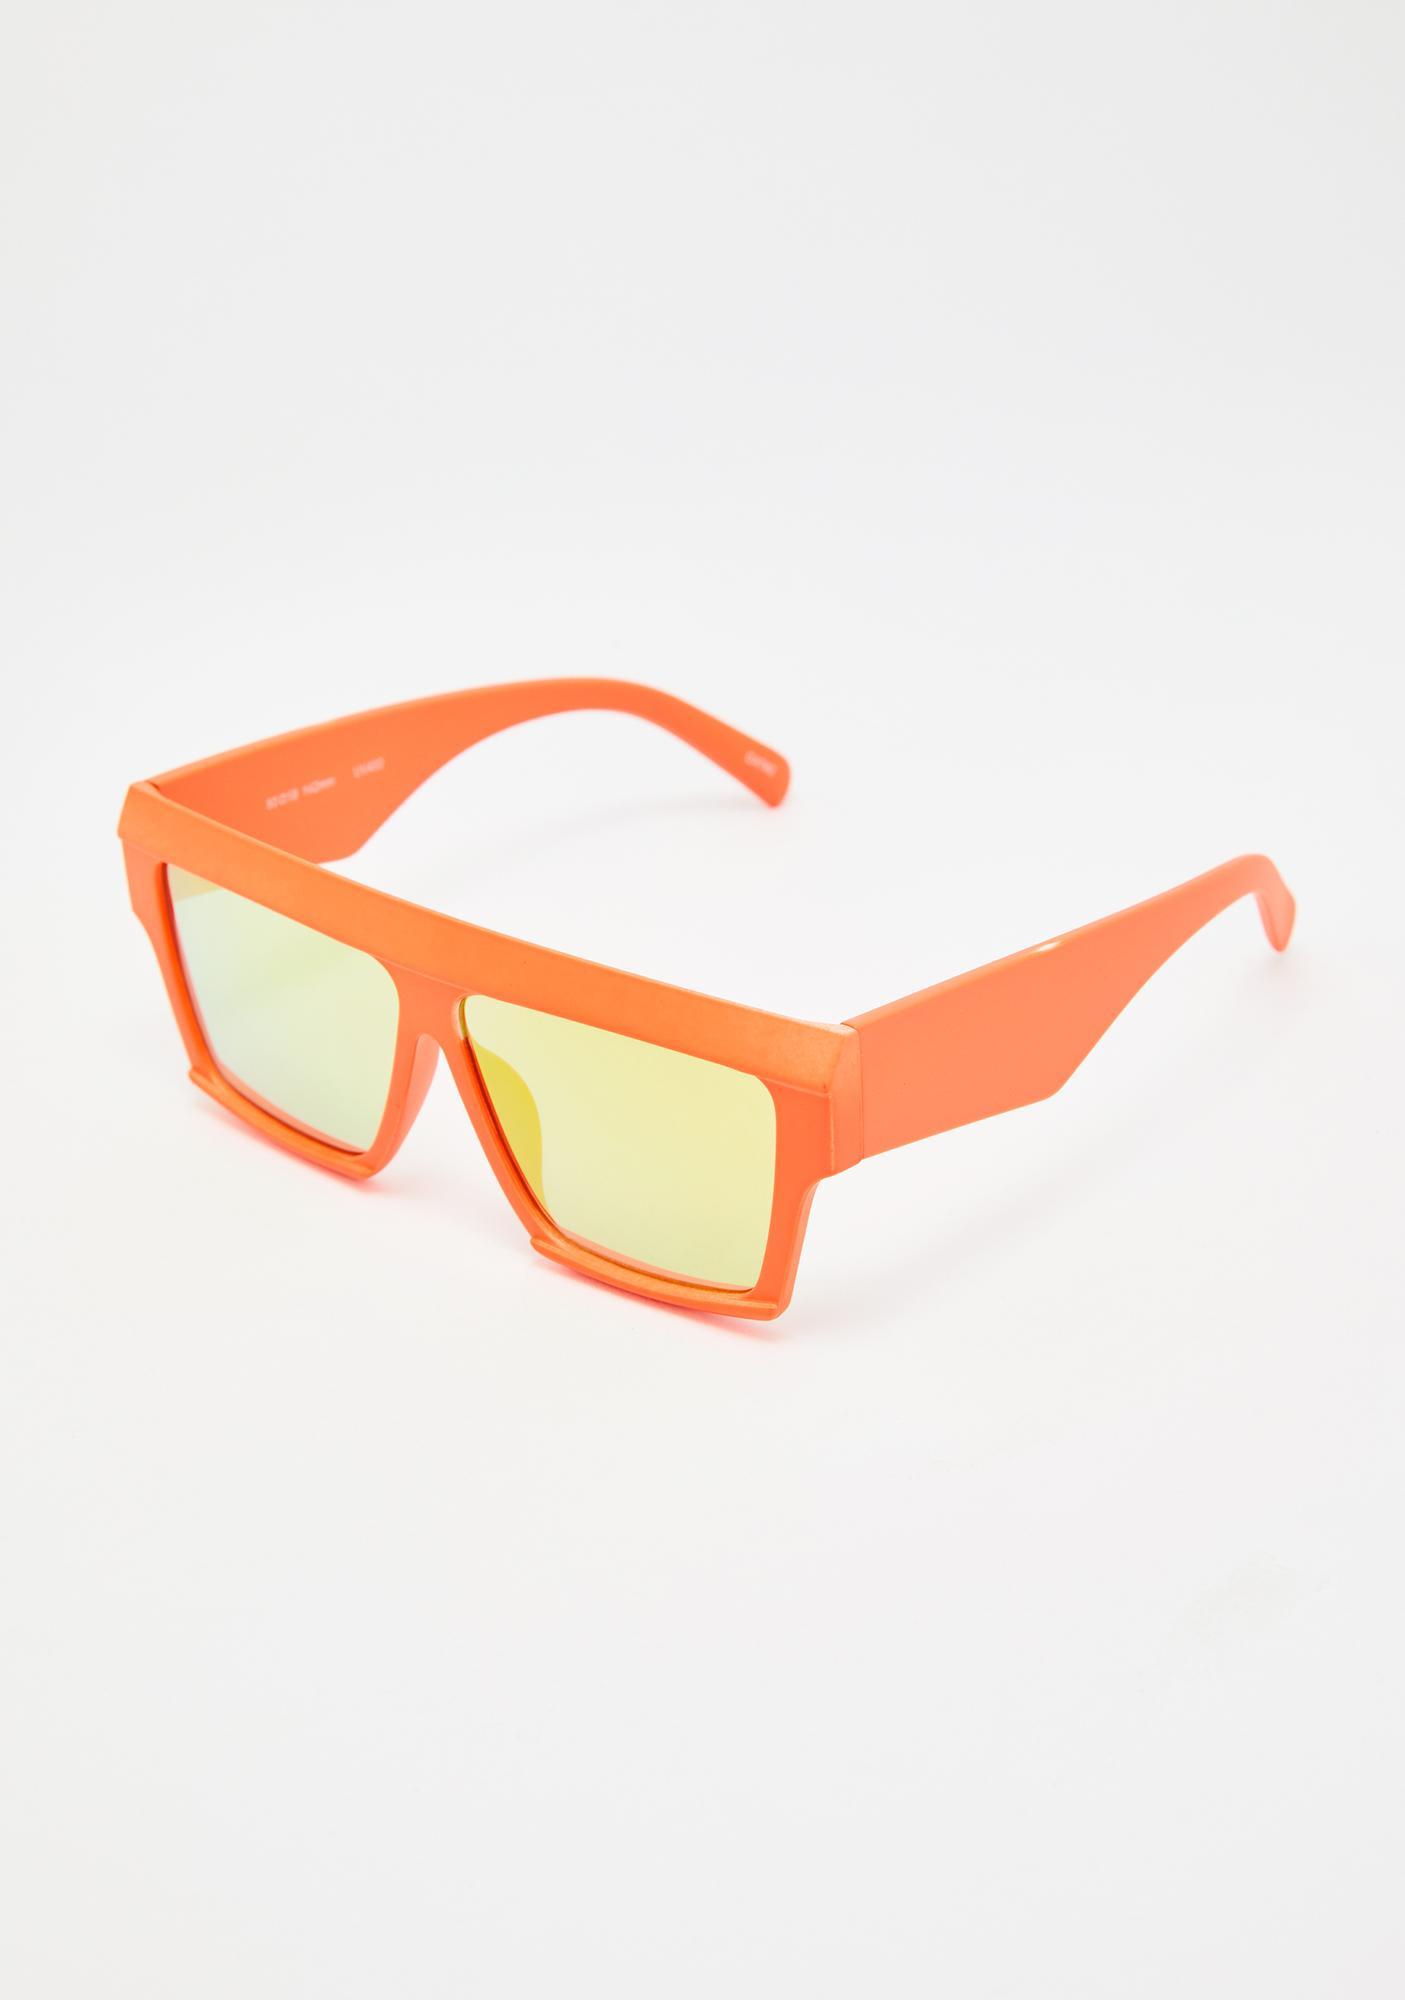 Summer Serenity Mirrored Sunglasses